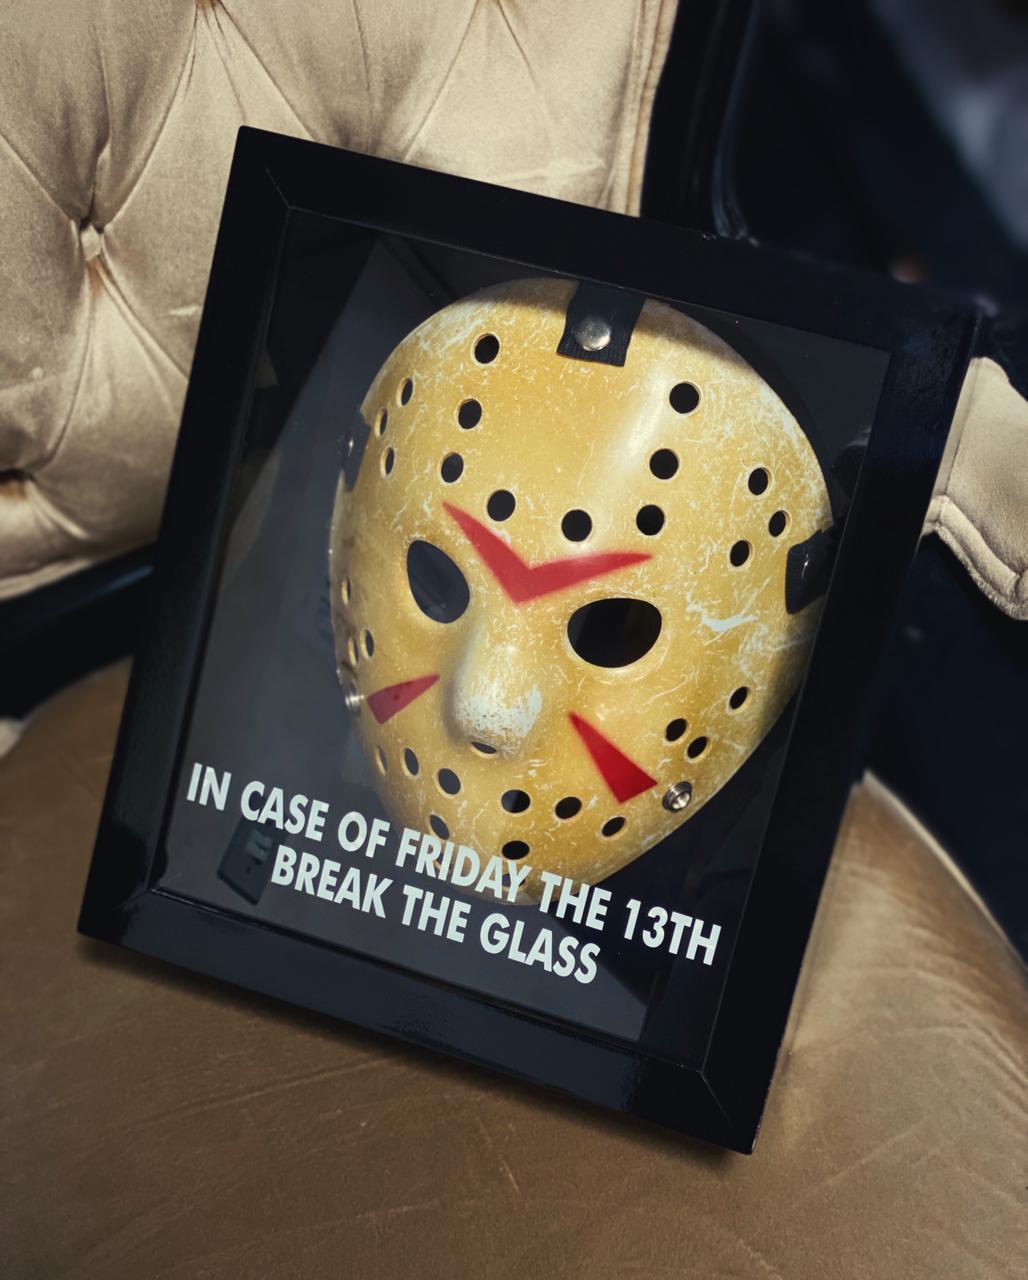 Máscara Com Caixa Jason Voorhee Em Caso de Sexta Feira 13 Quebre o Vidro In Case Of Friday The 13th Break The Glass